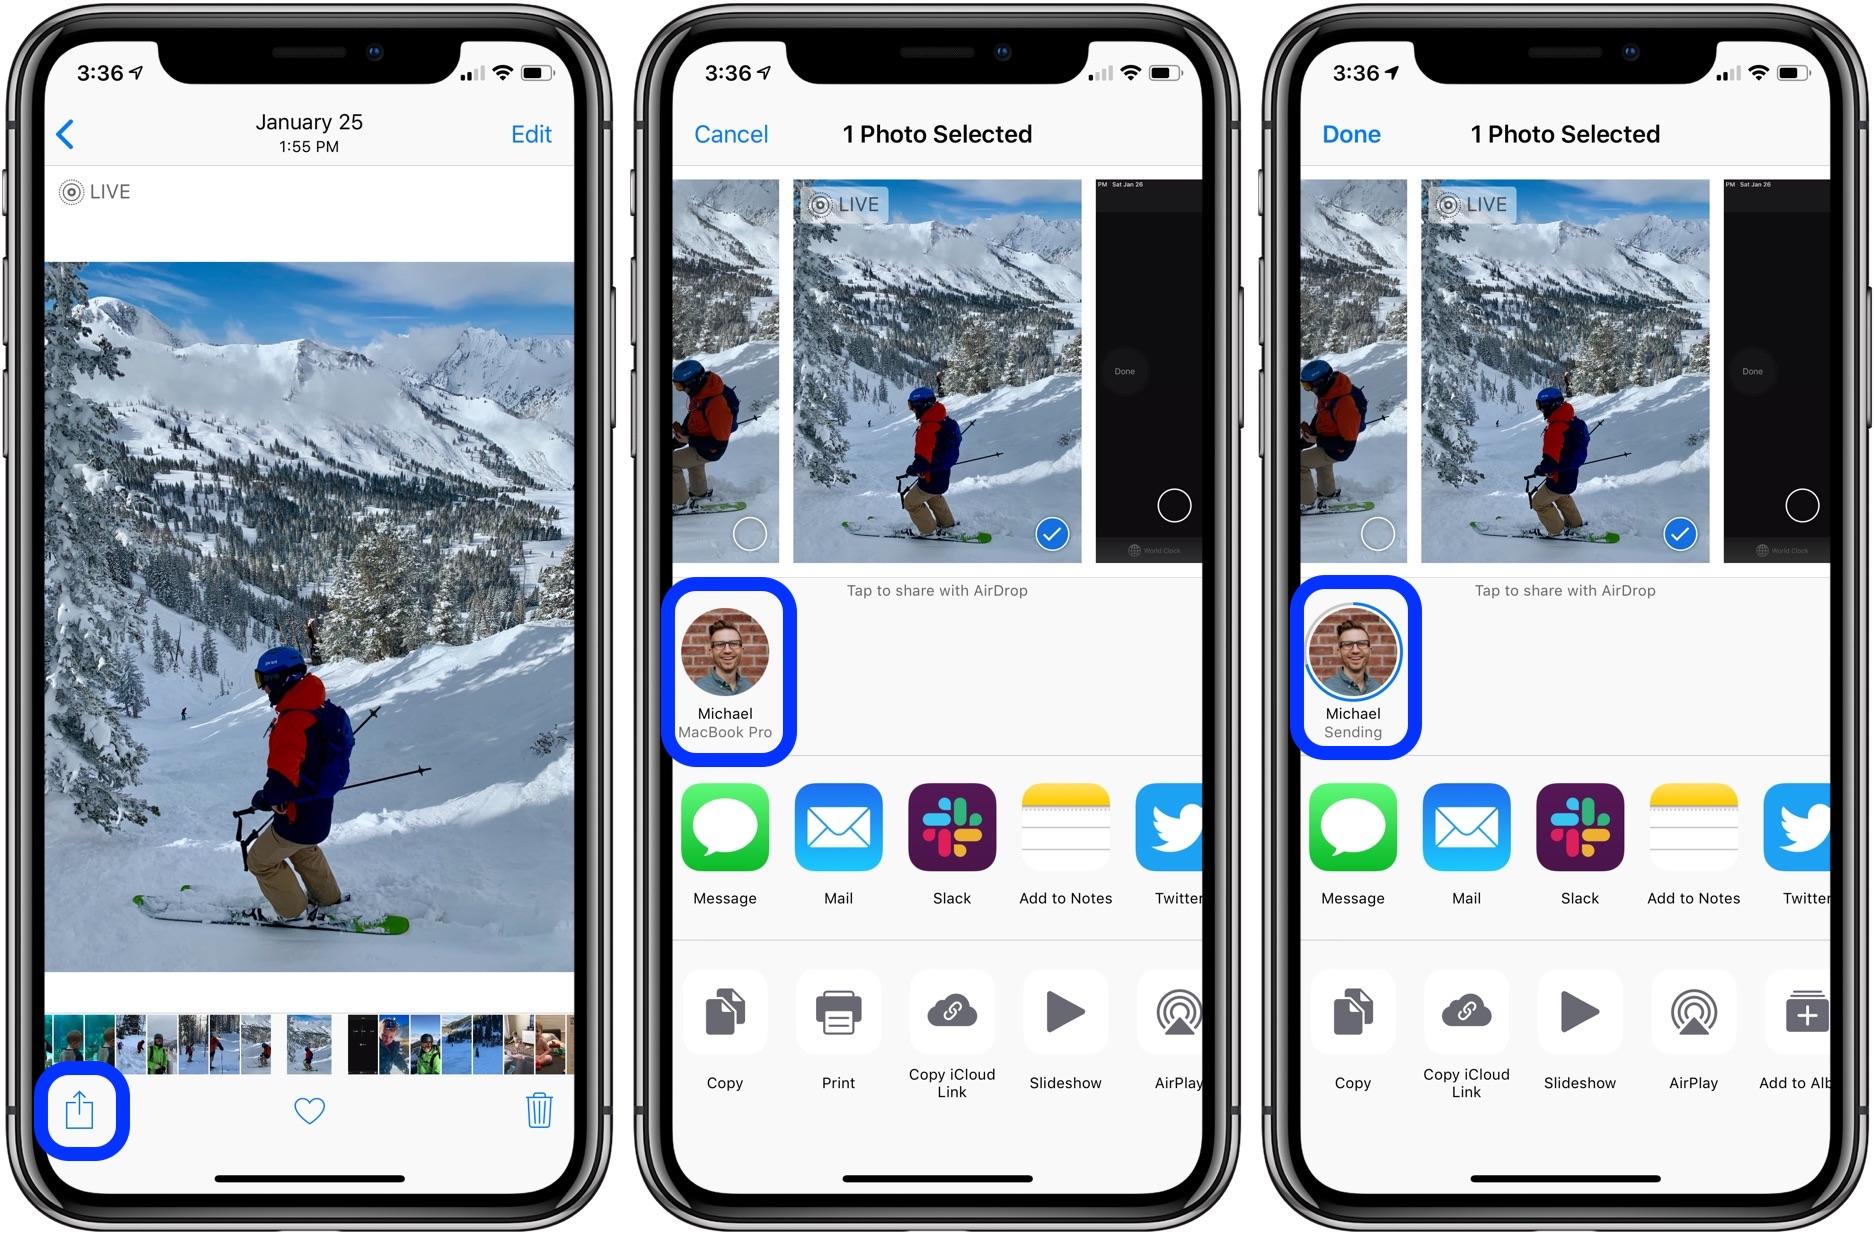 AirDrop iPhone to Mac walkthrough